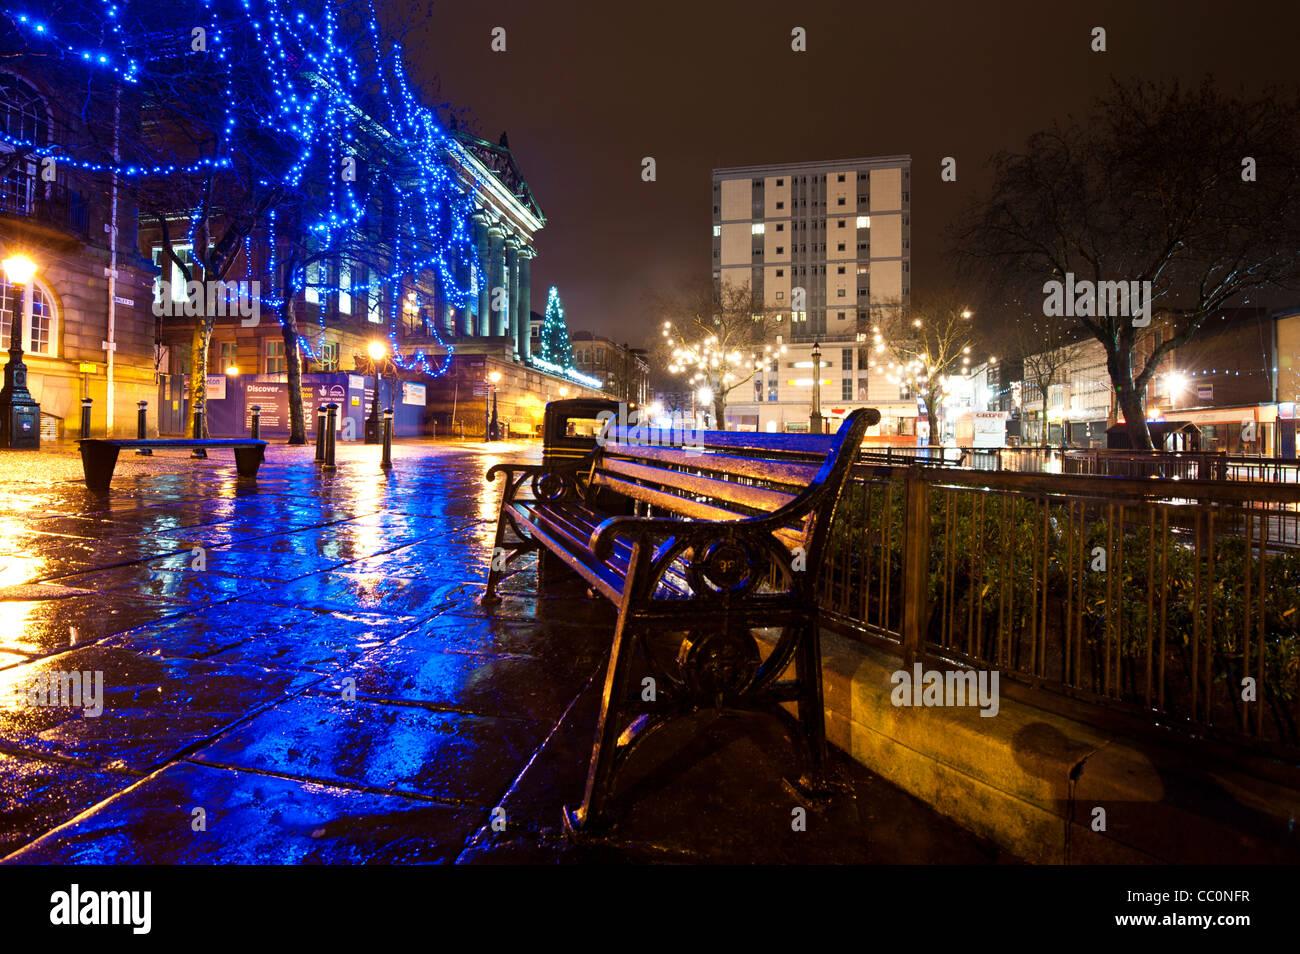 Preston Christmas Lights Stock Photo: 41813515 - Alamy